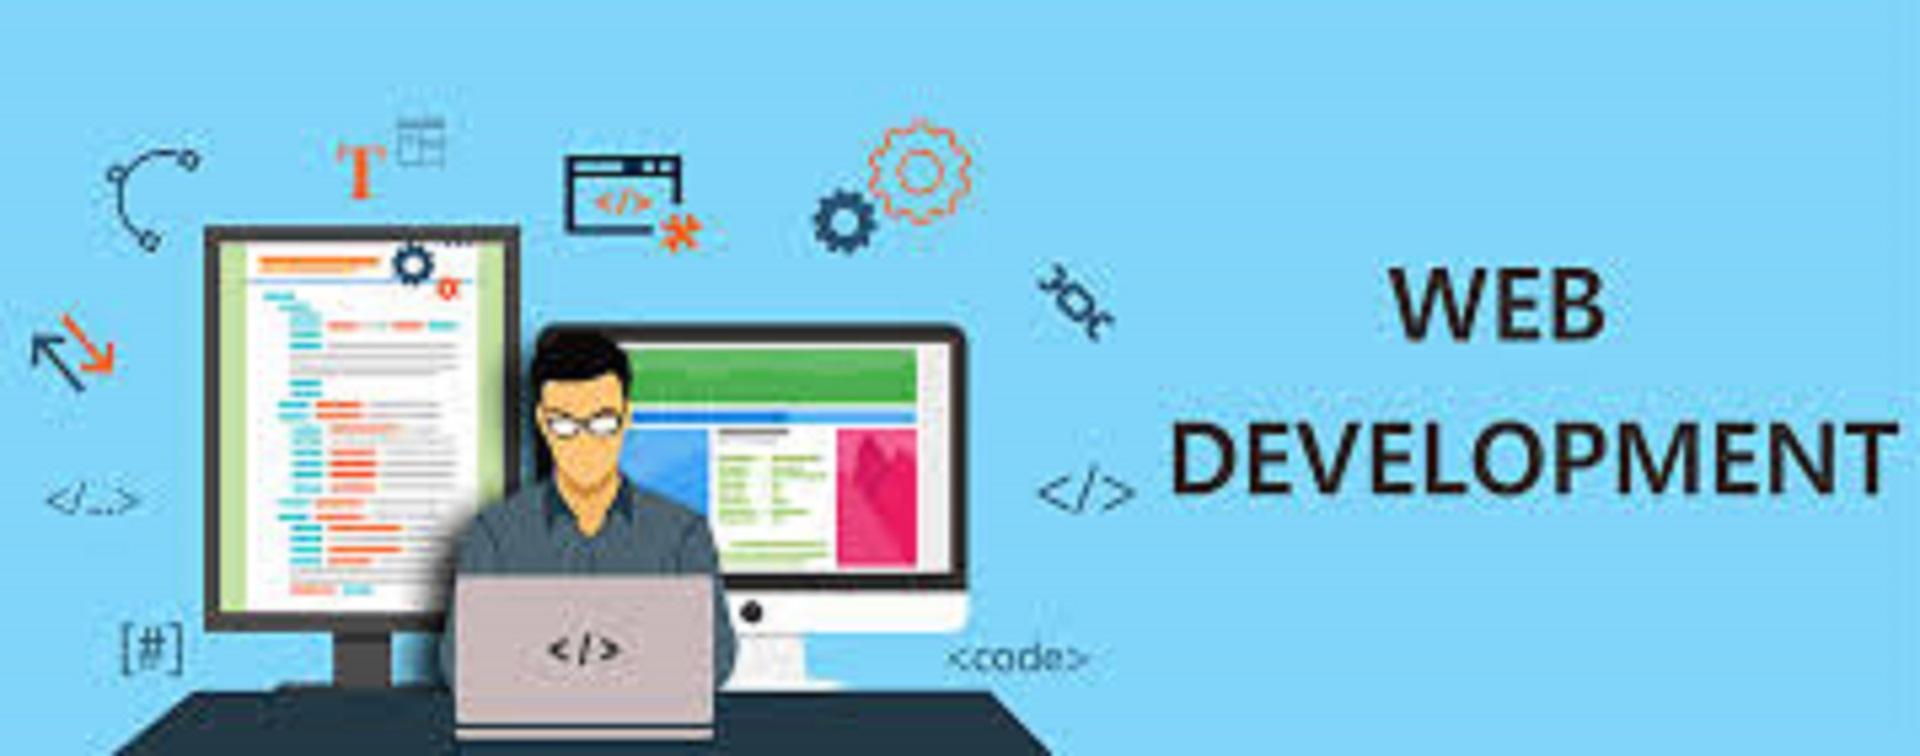 I'm Your Web Developer In Php,Codeigniter,Database,Wordpress